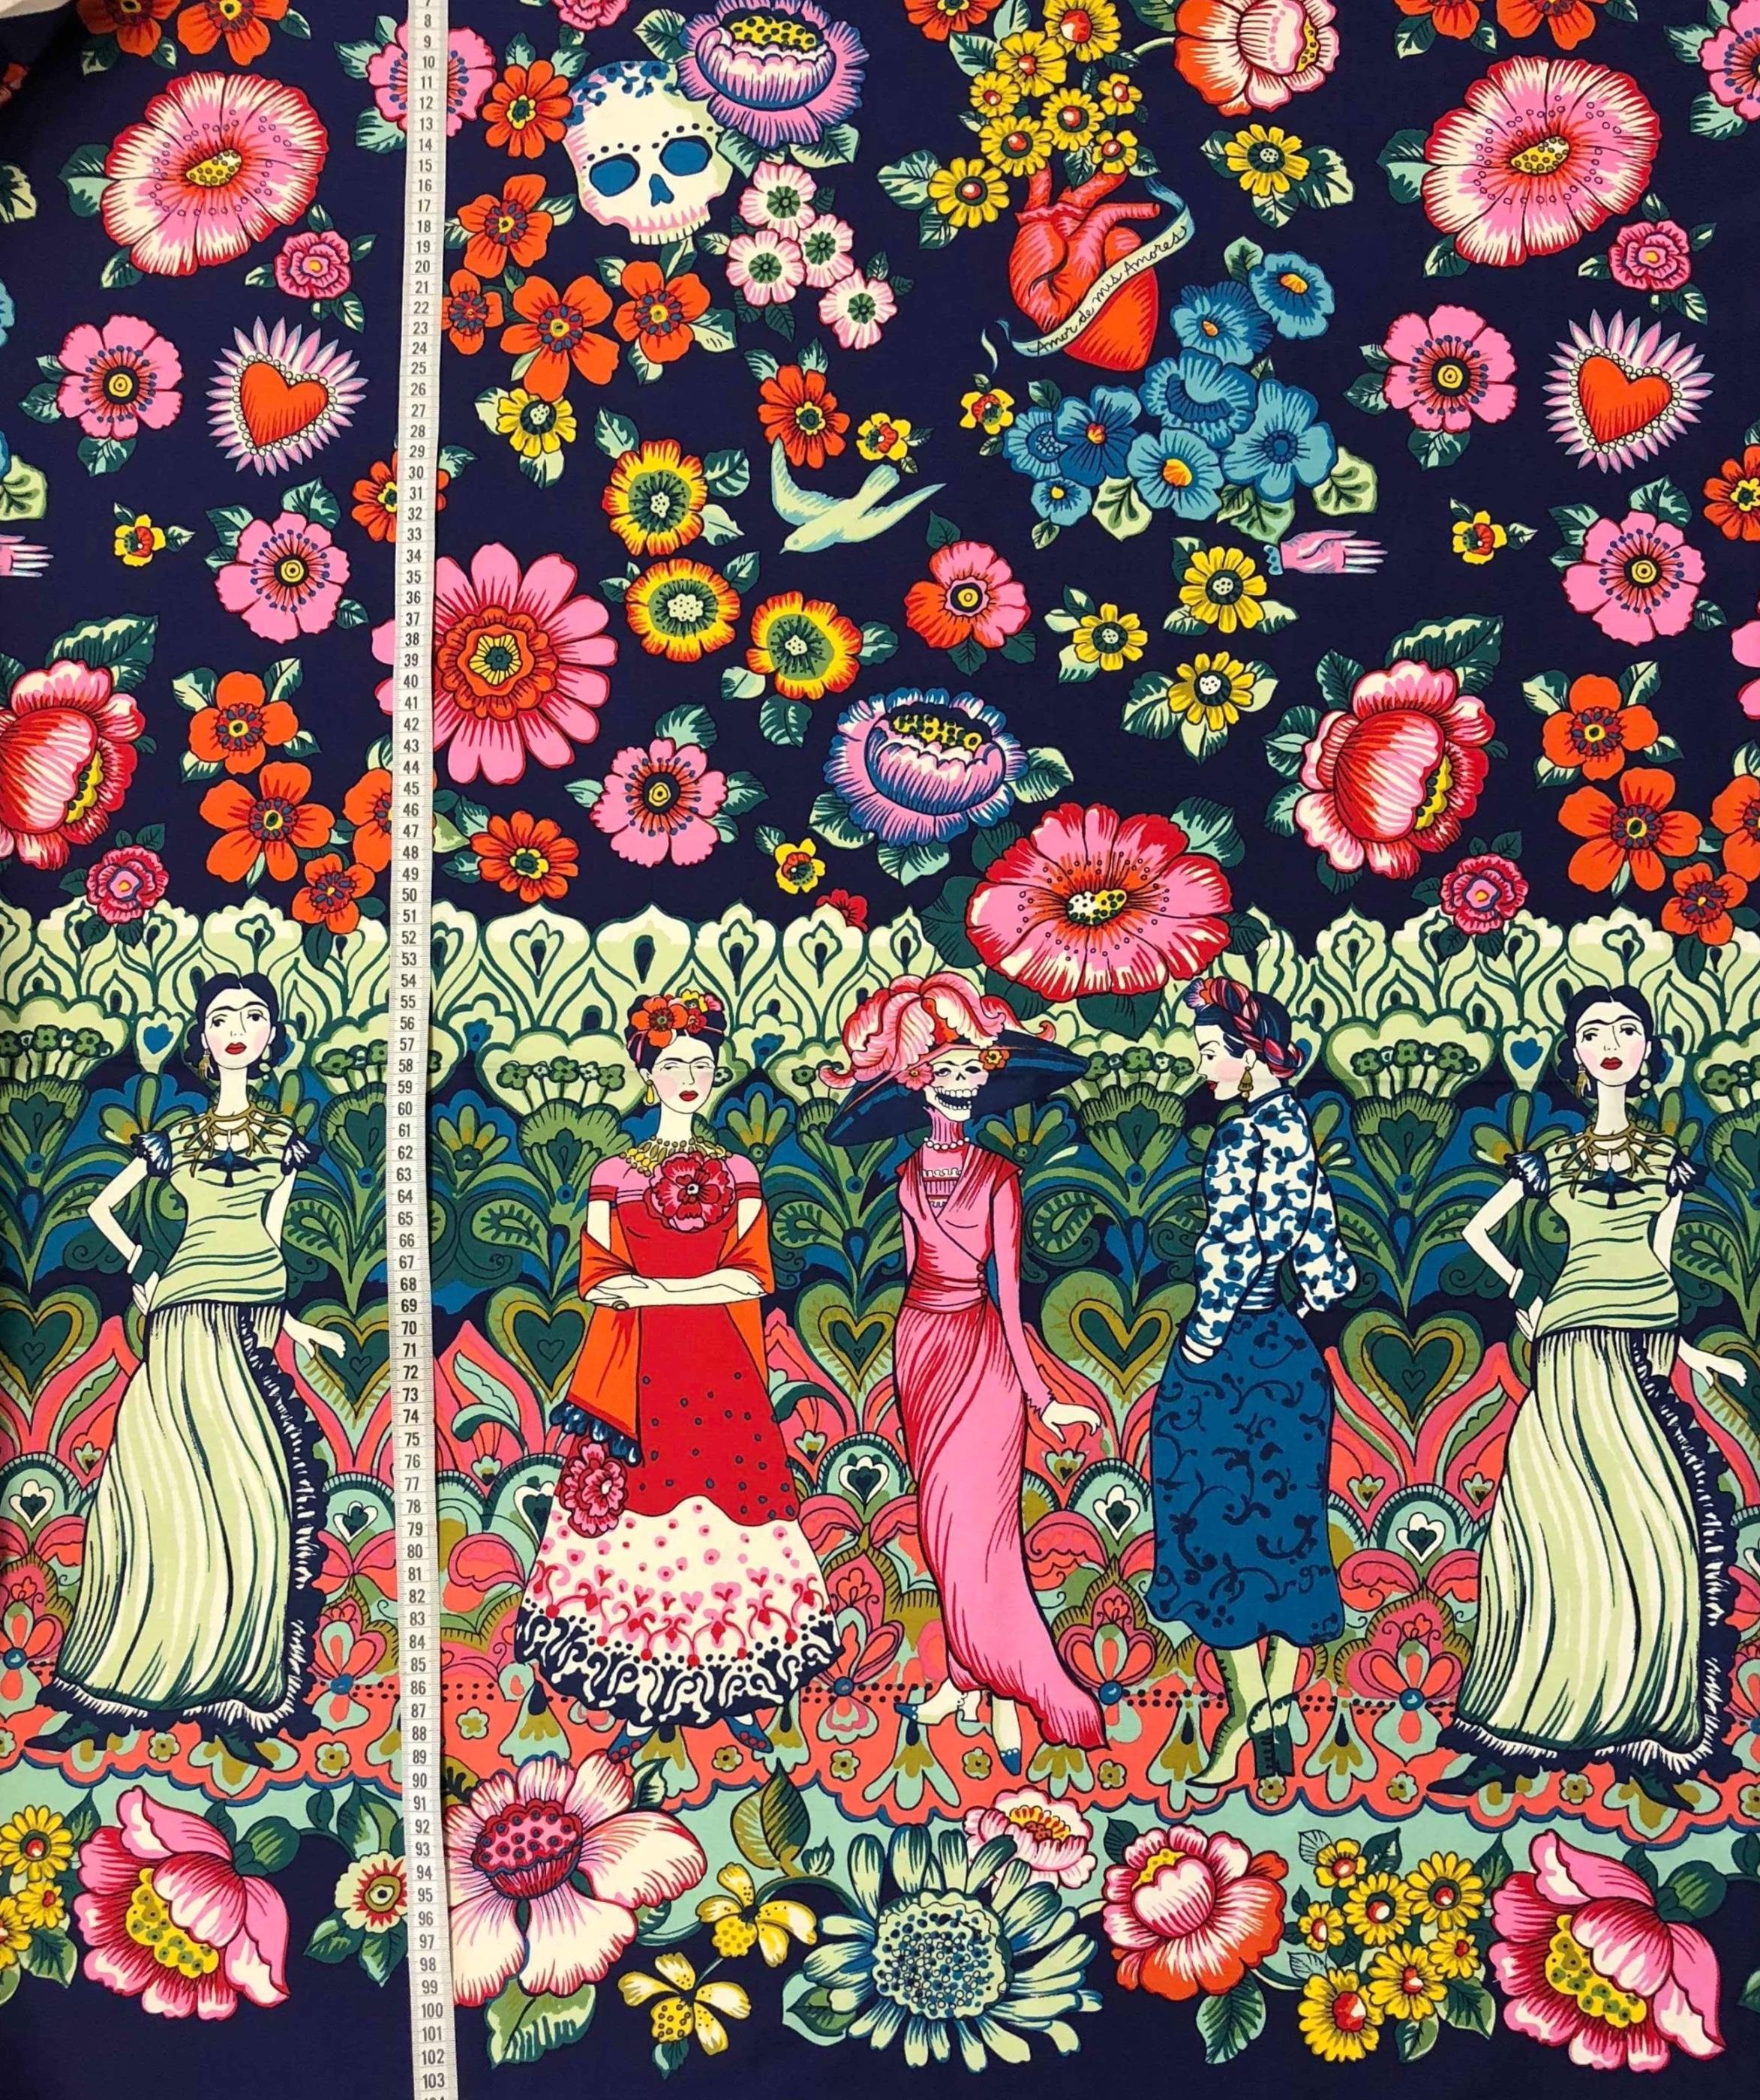 Frida Kahlo bomullstyg metervara modetyg färg konst karaktär Tyglust Laholm